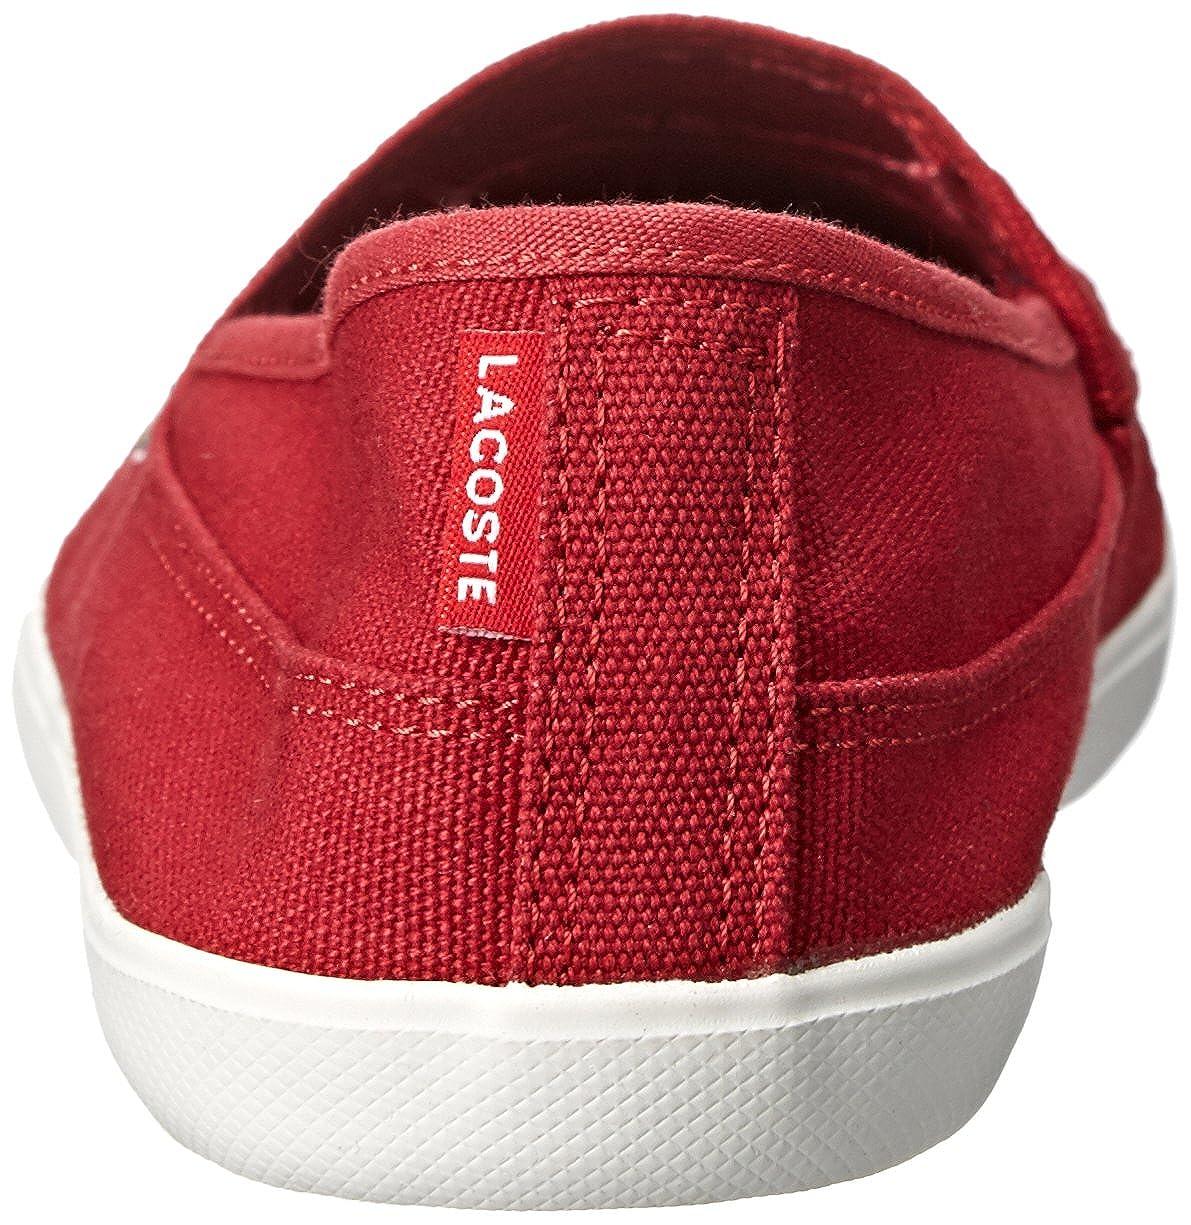 49a711158dd90 Lacoste Women s Marice Canvas Slip On  Lacoste  Amazon.ca  Shoes   Handbags